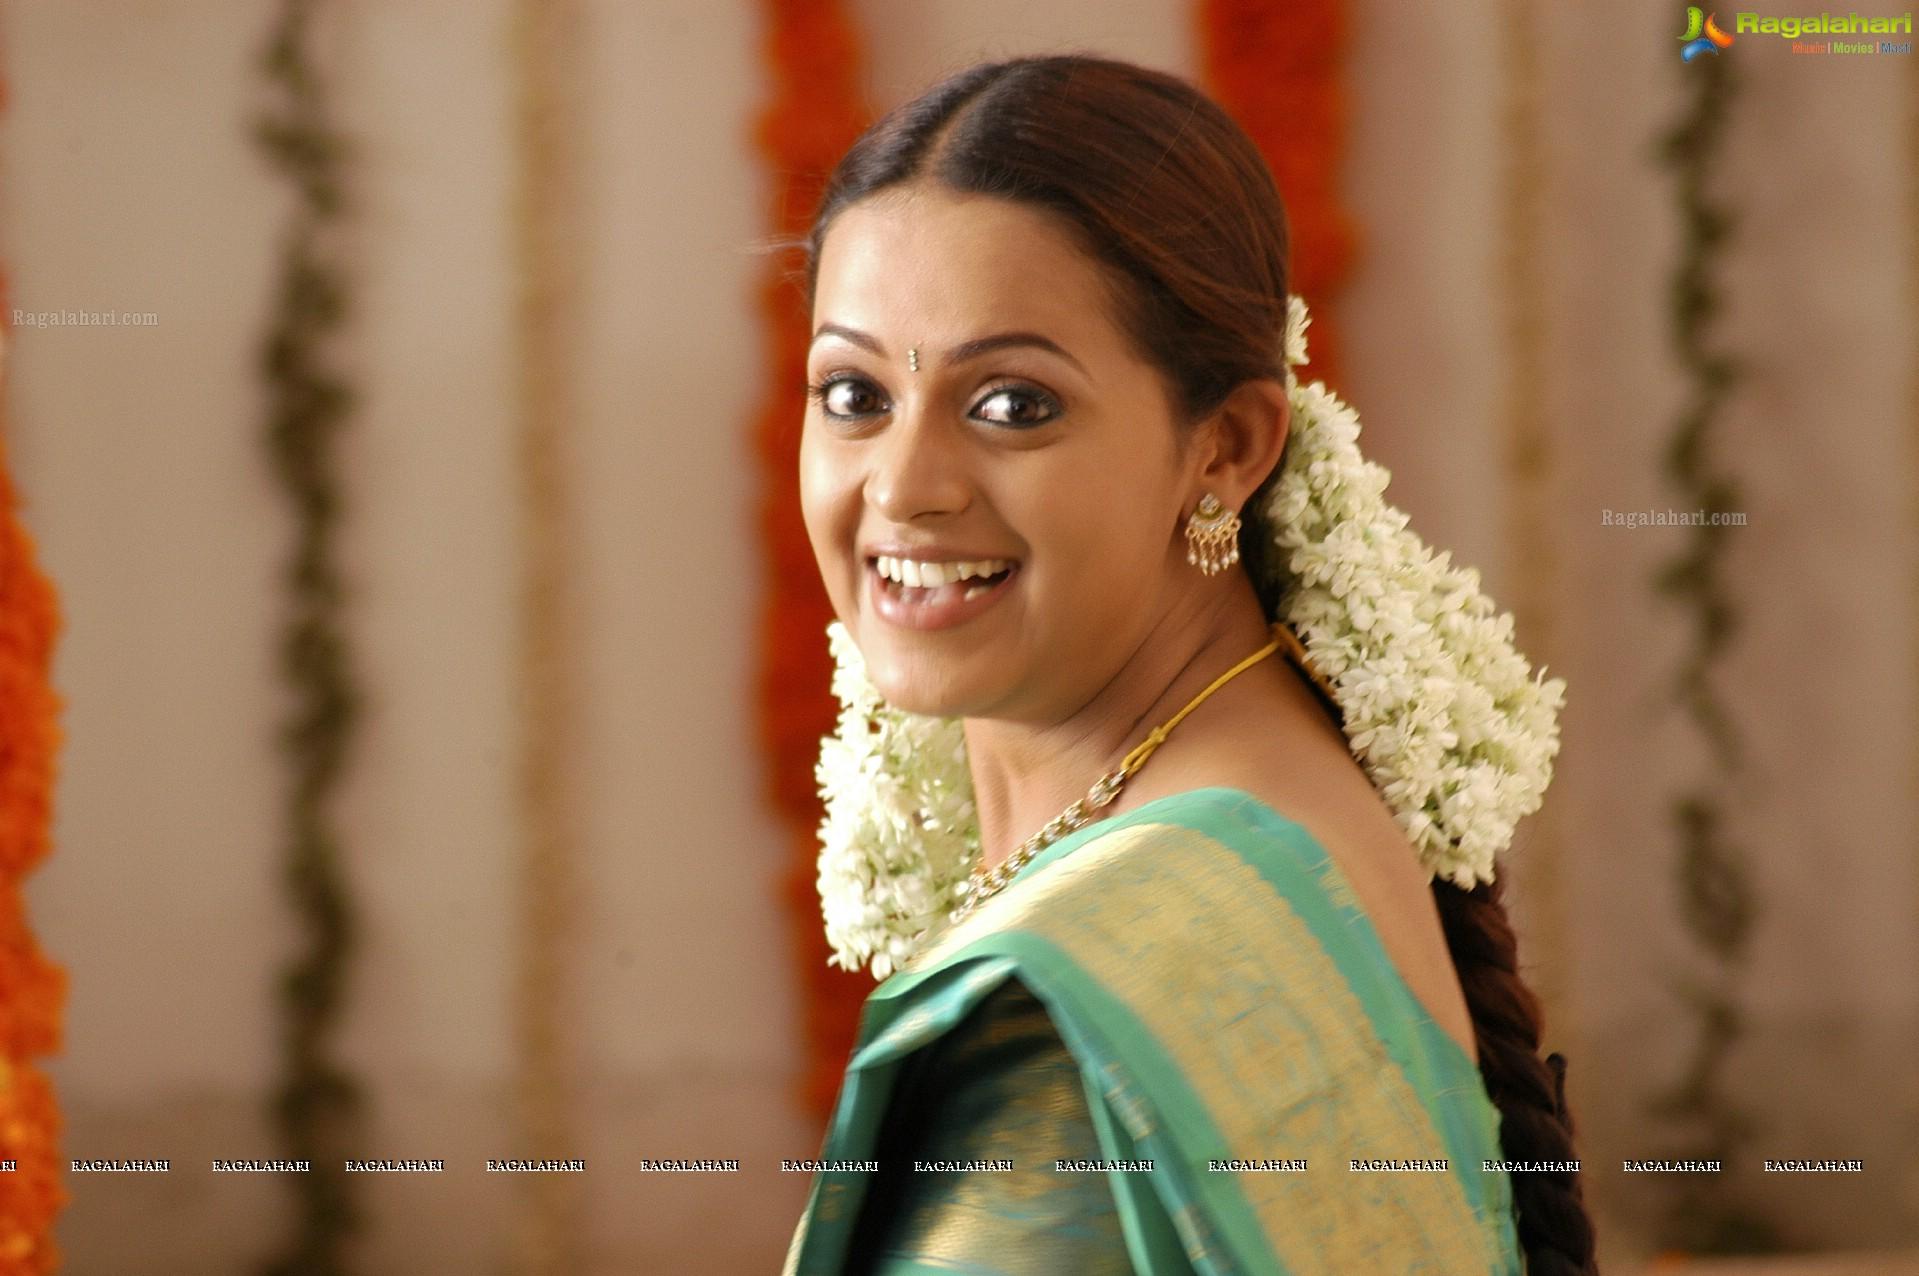 Bhavana hd image 16 tollywood actress hot imagesimages photos bhavana hd altavistaventures Image collections